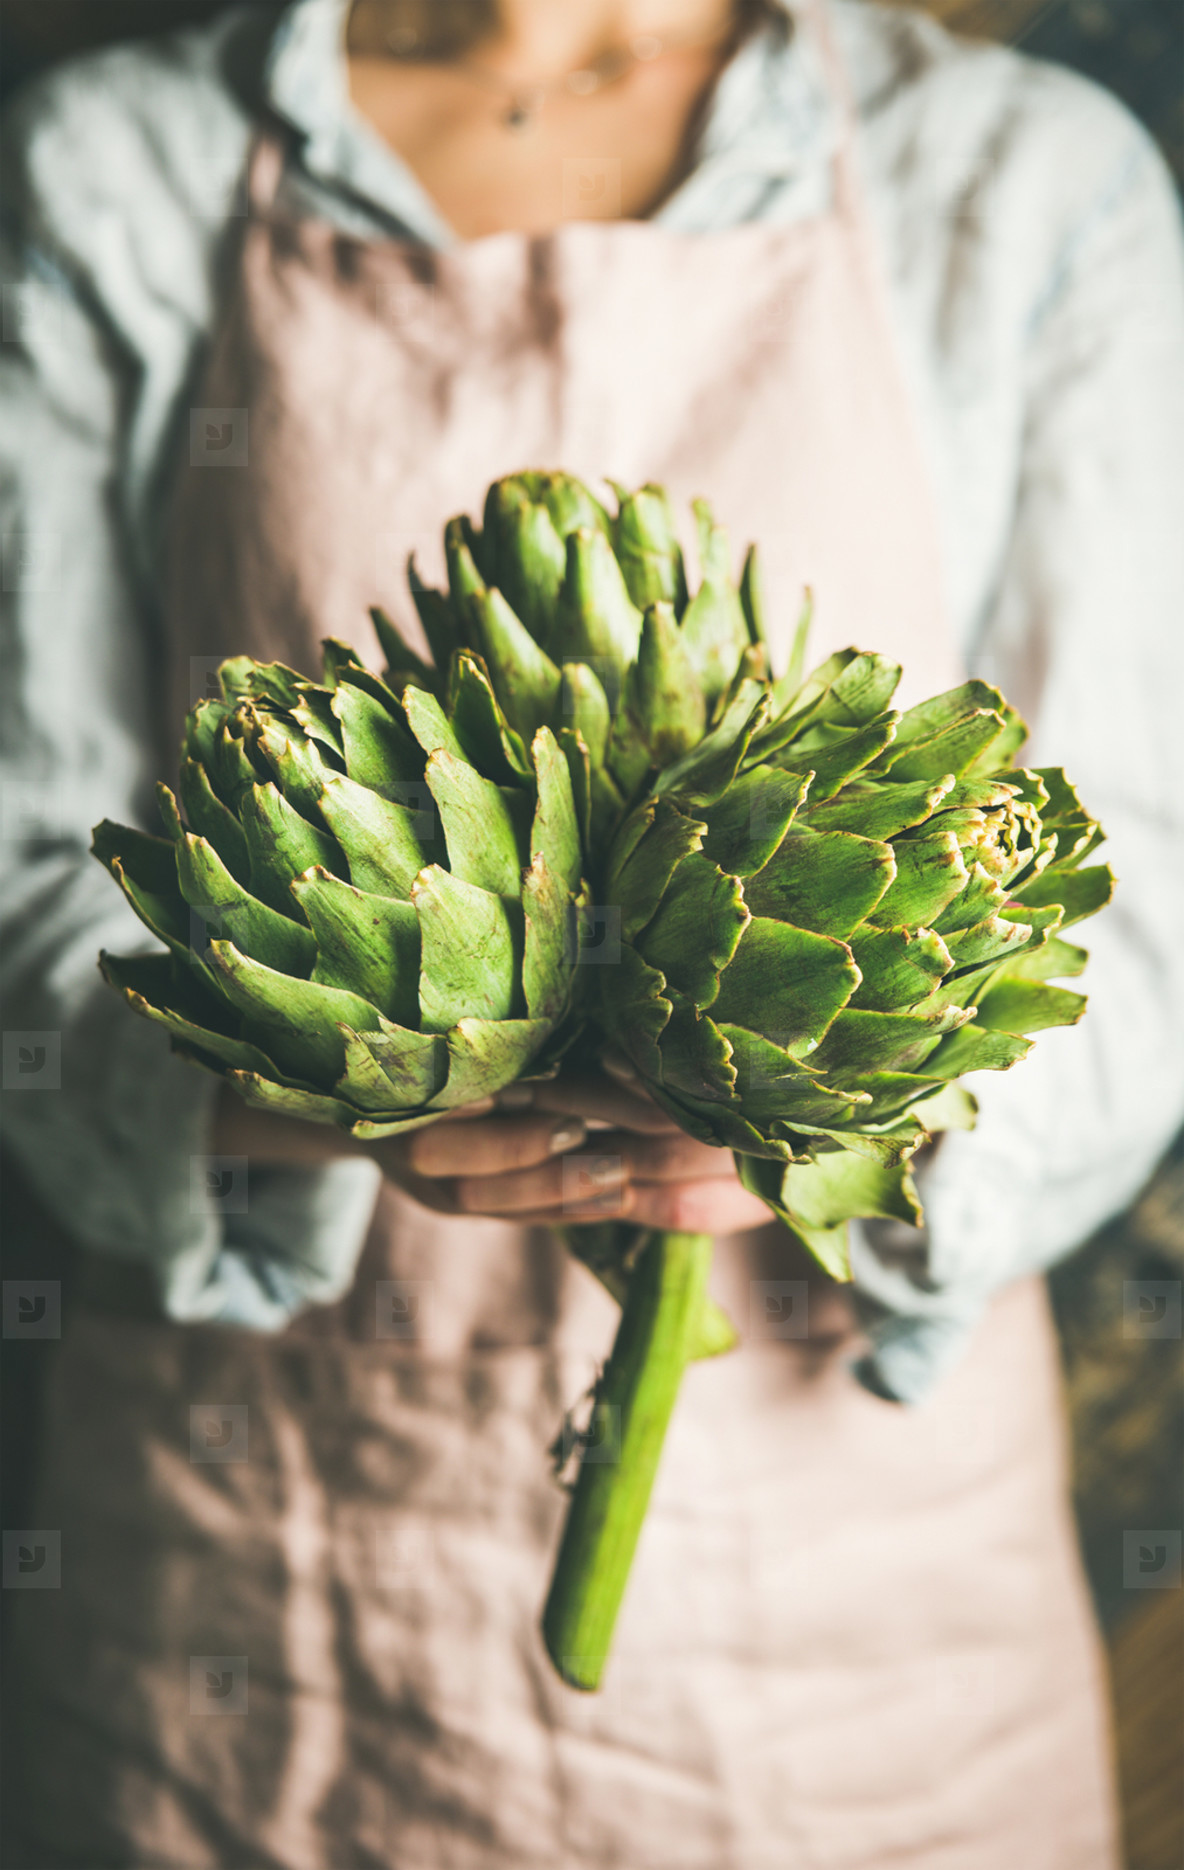 Female farmer holding fresh artichokes